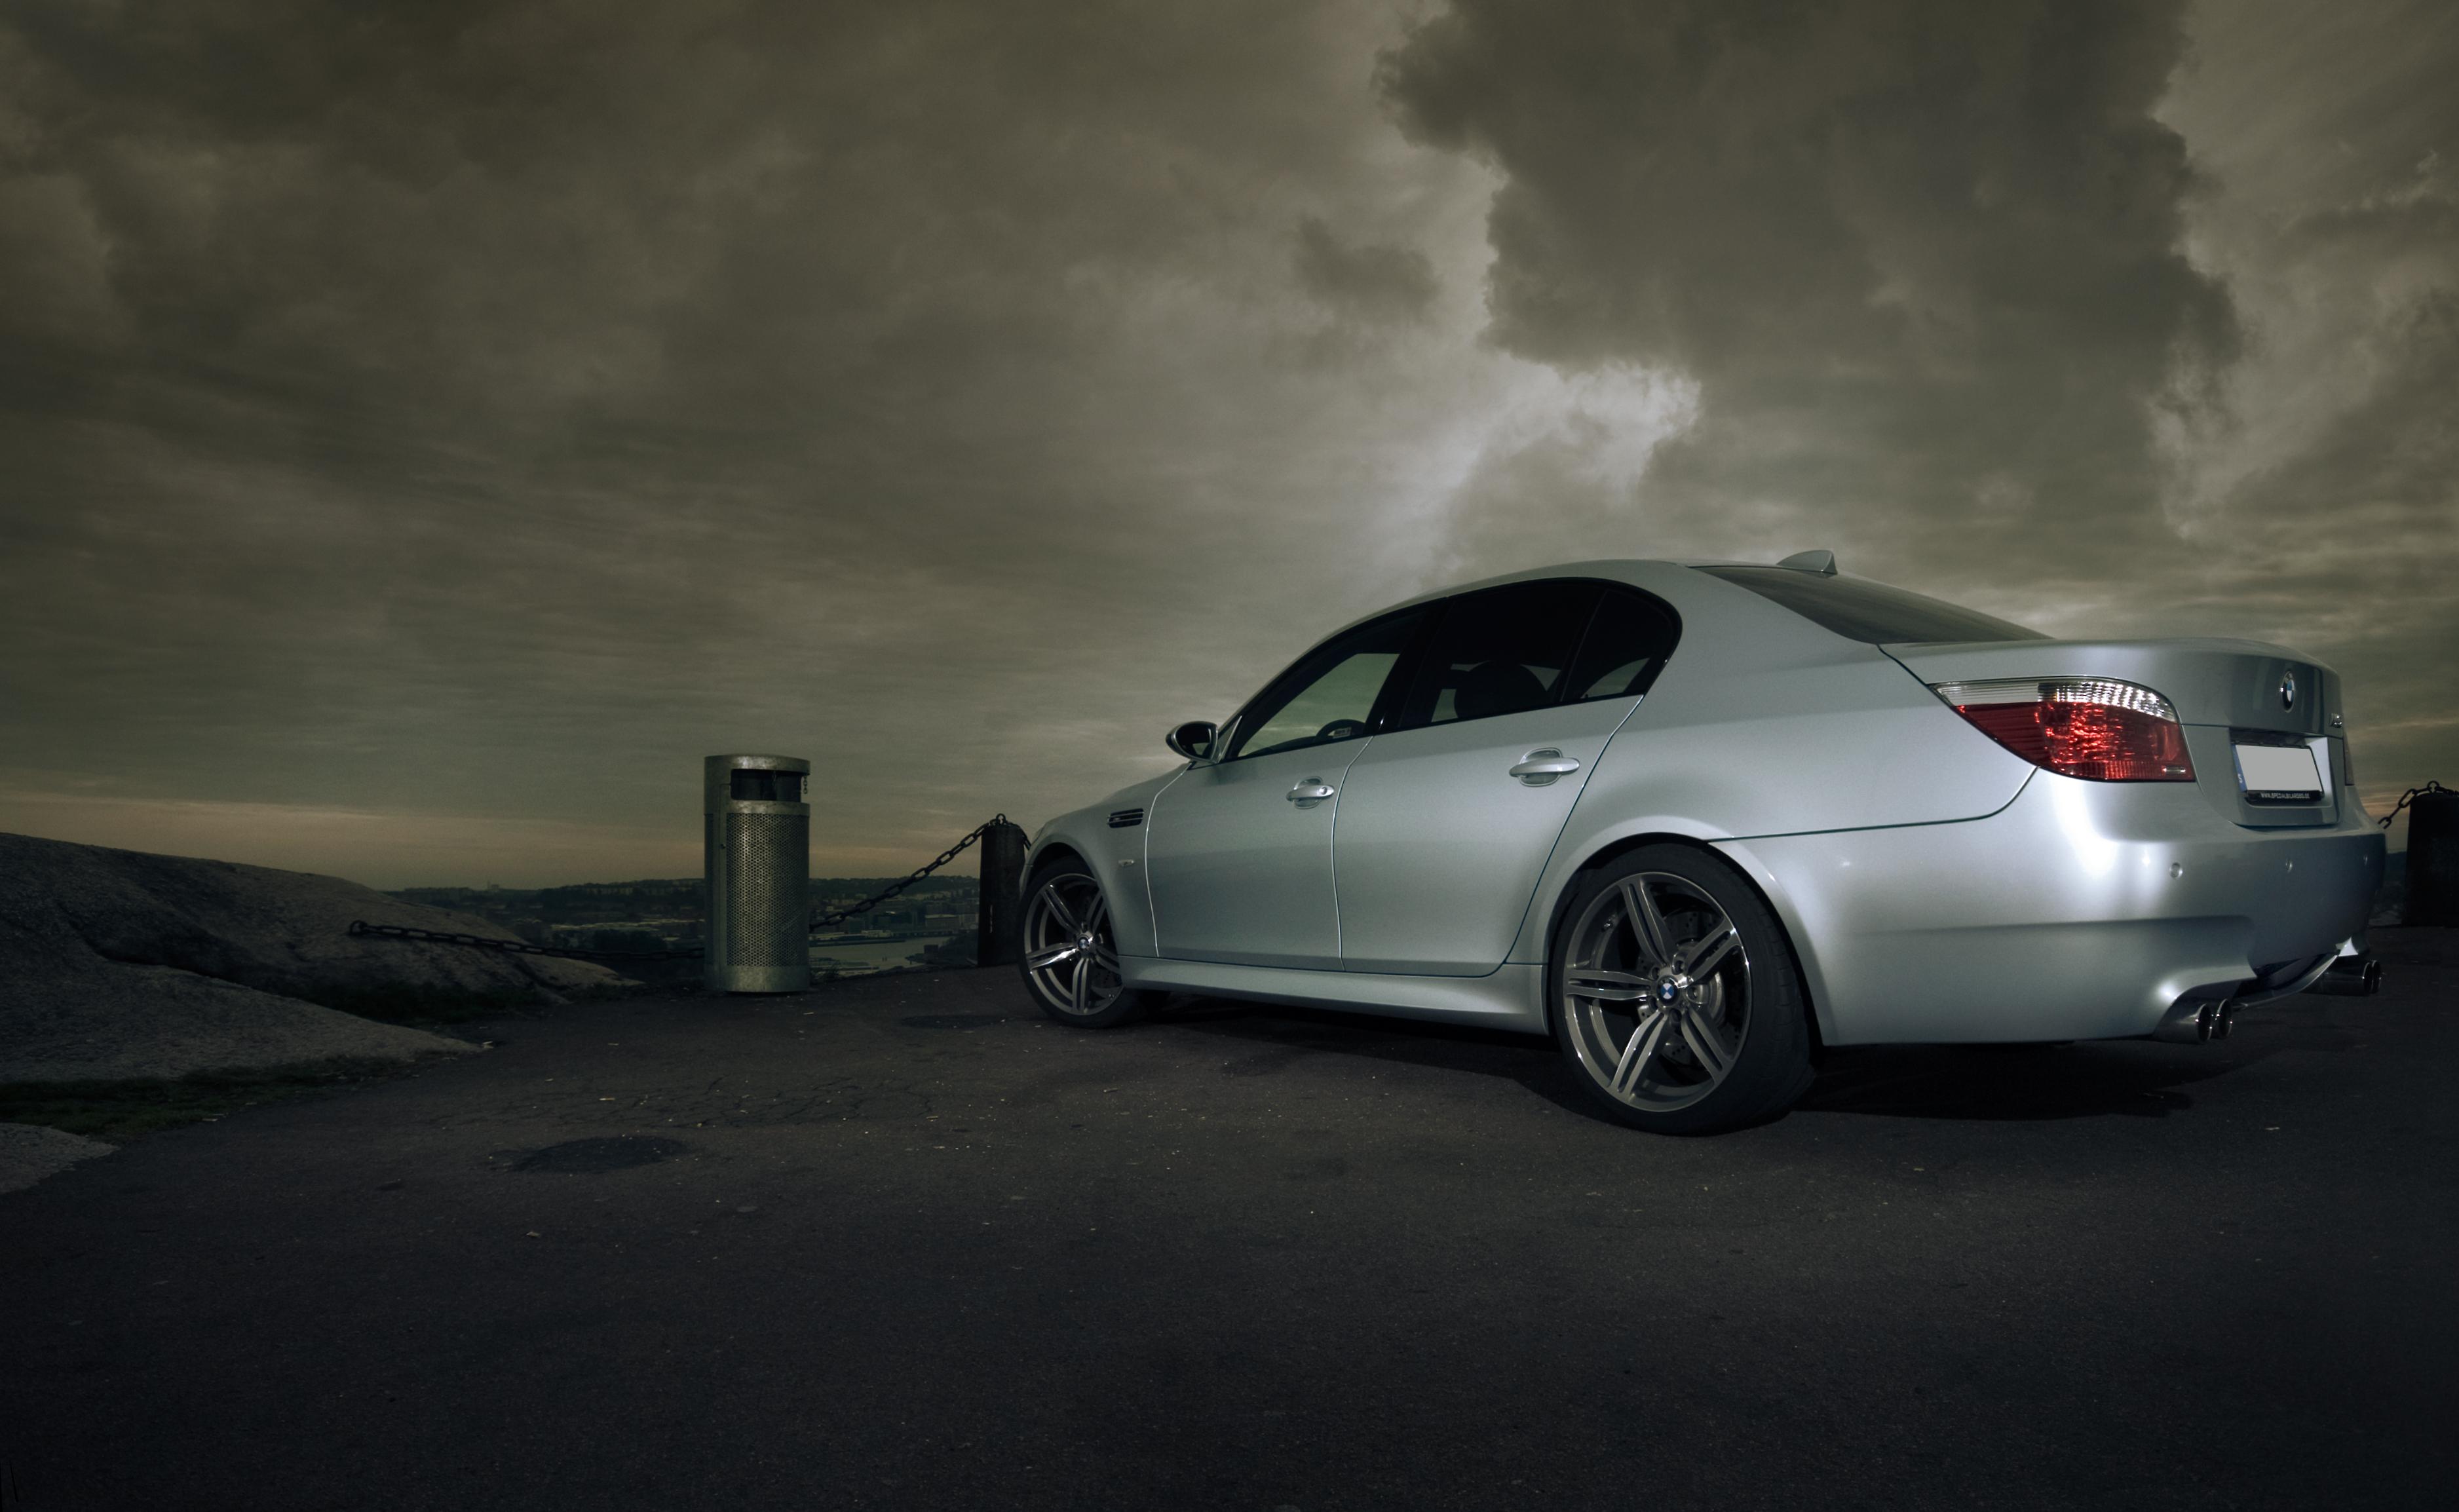 Автомобили БМВ серии М - BMW M5 Седан. .  Недосягаемый.  Bmw m5 e60 on Vossen.